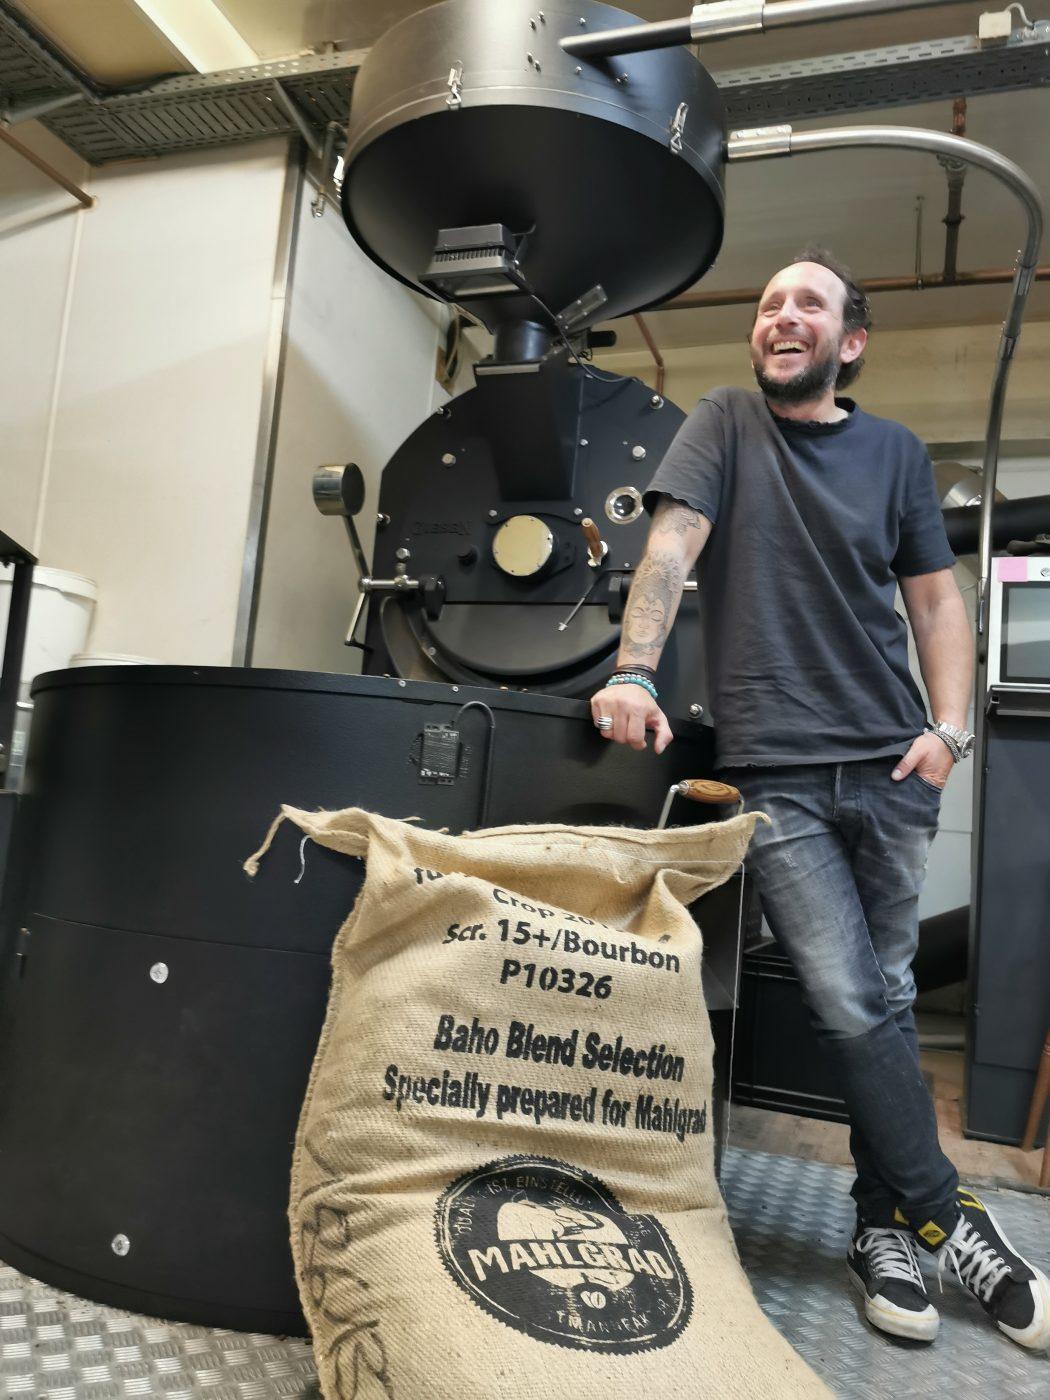 Das Foto zeigt Mario Grube, den Gründer der Kaffeerösterei Mahlgrad in Kamp-Lintfort